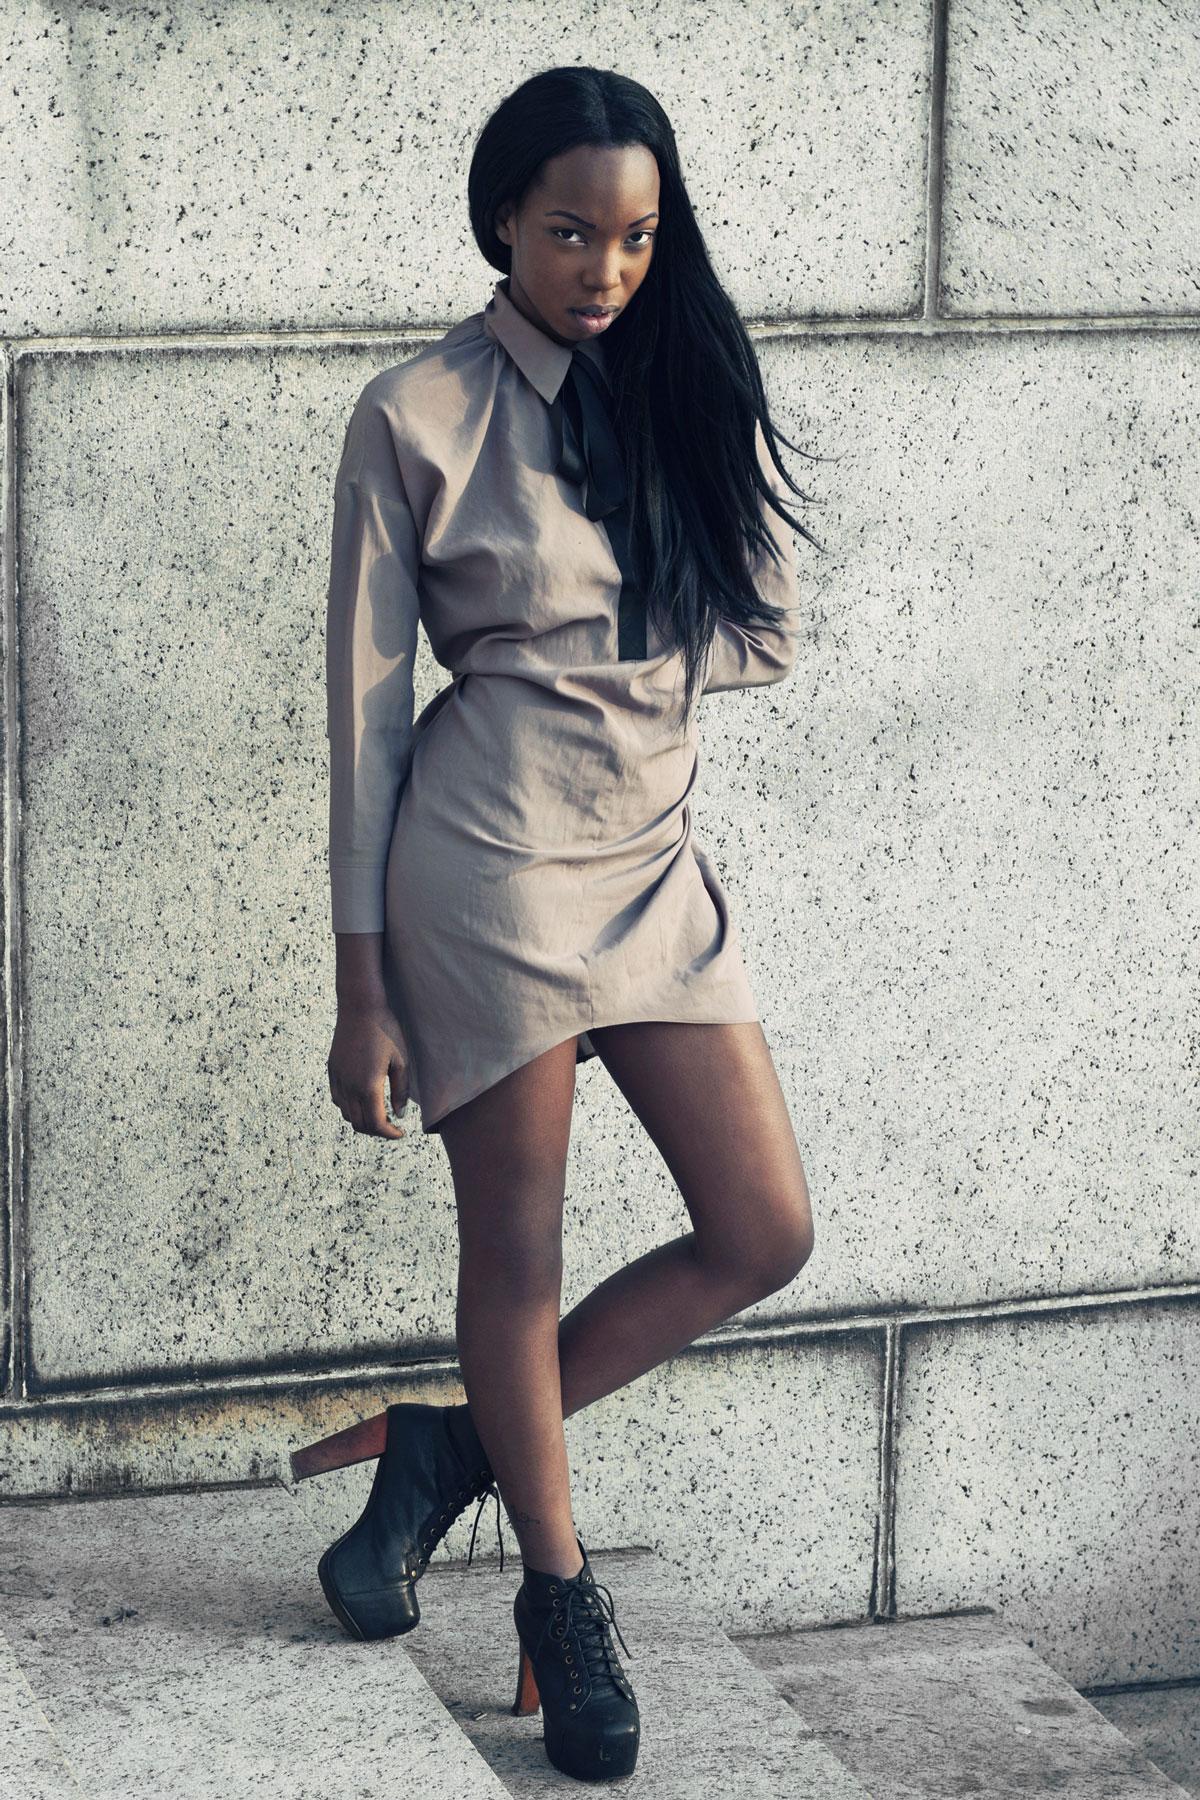 black-model-french-nyc-female.jpg